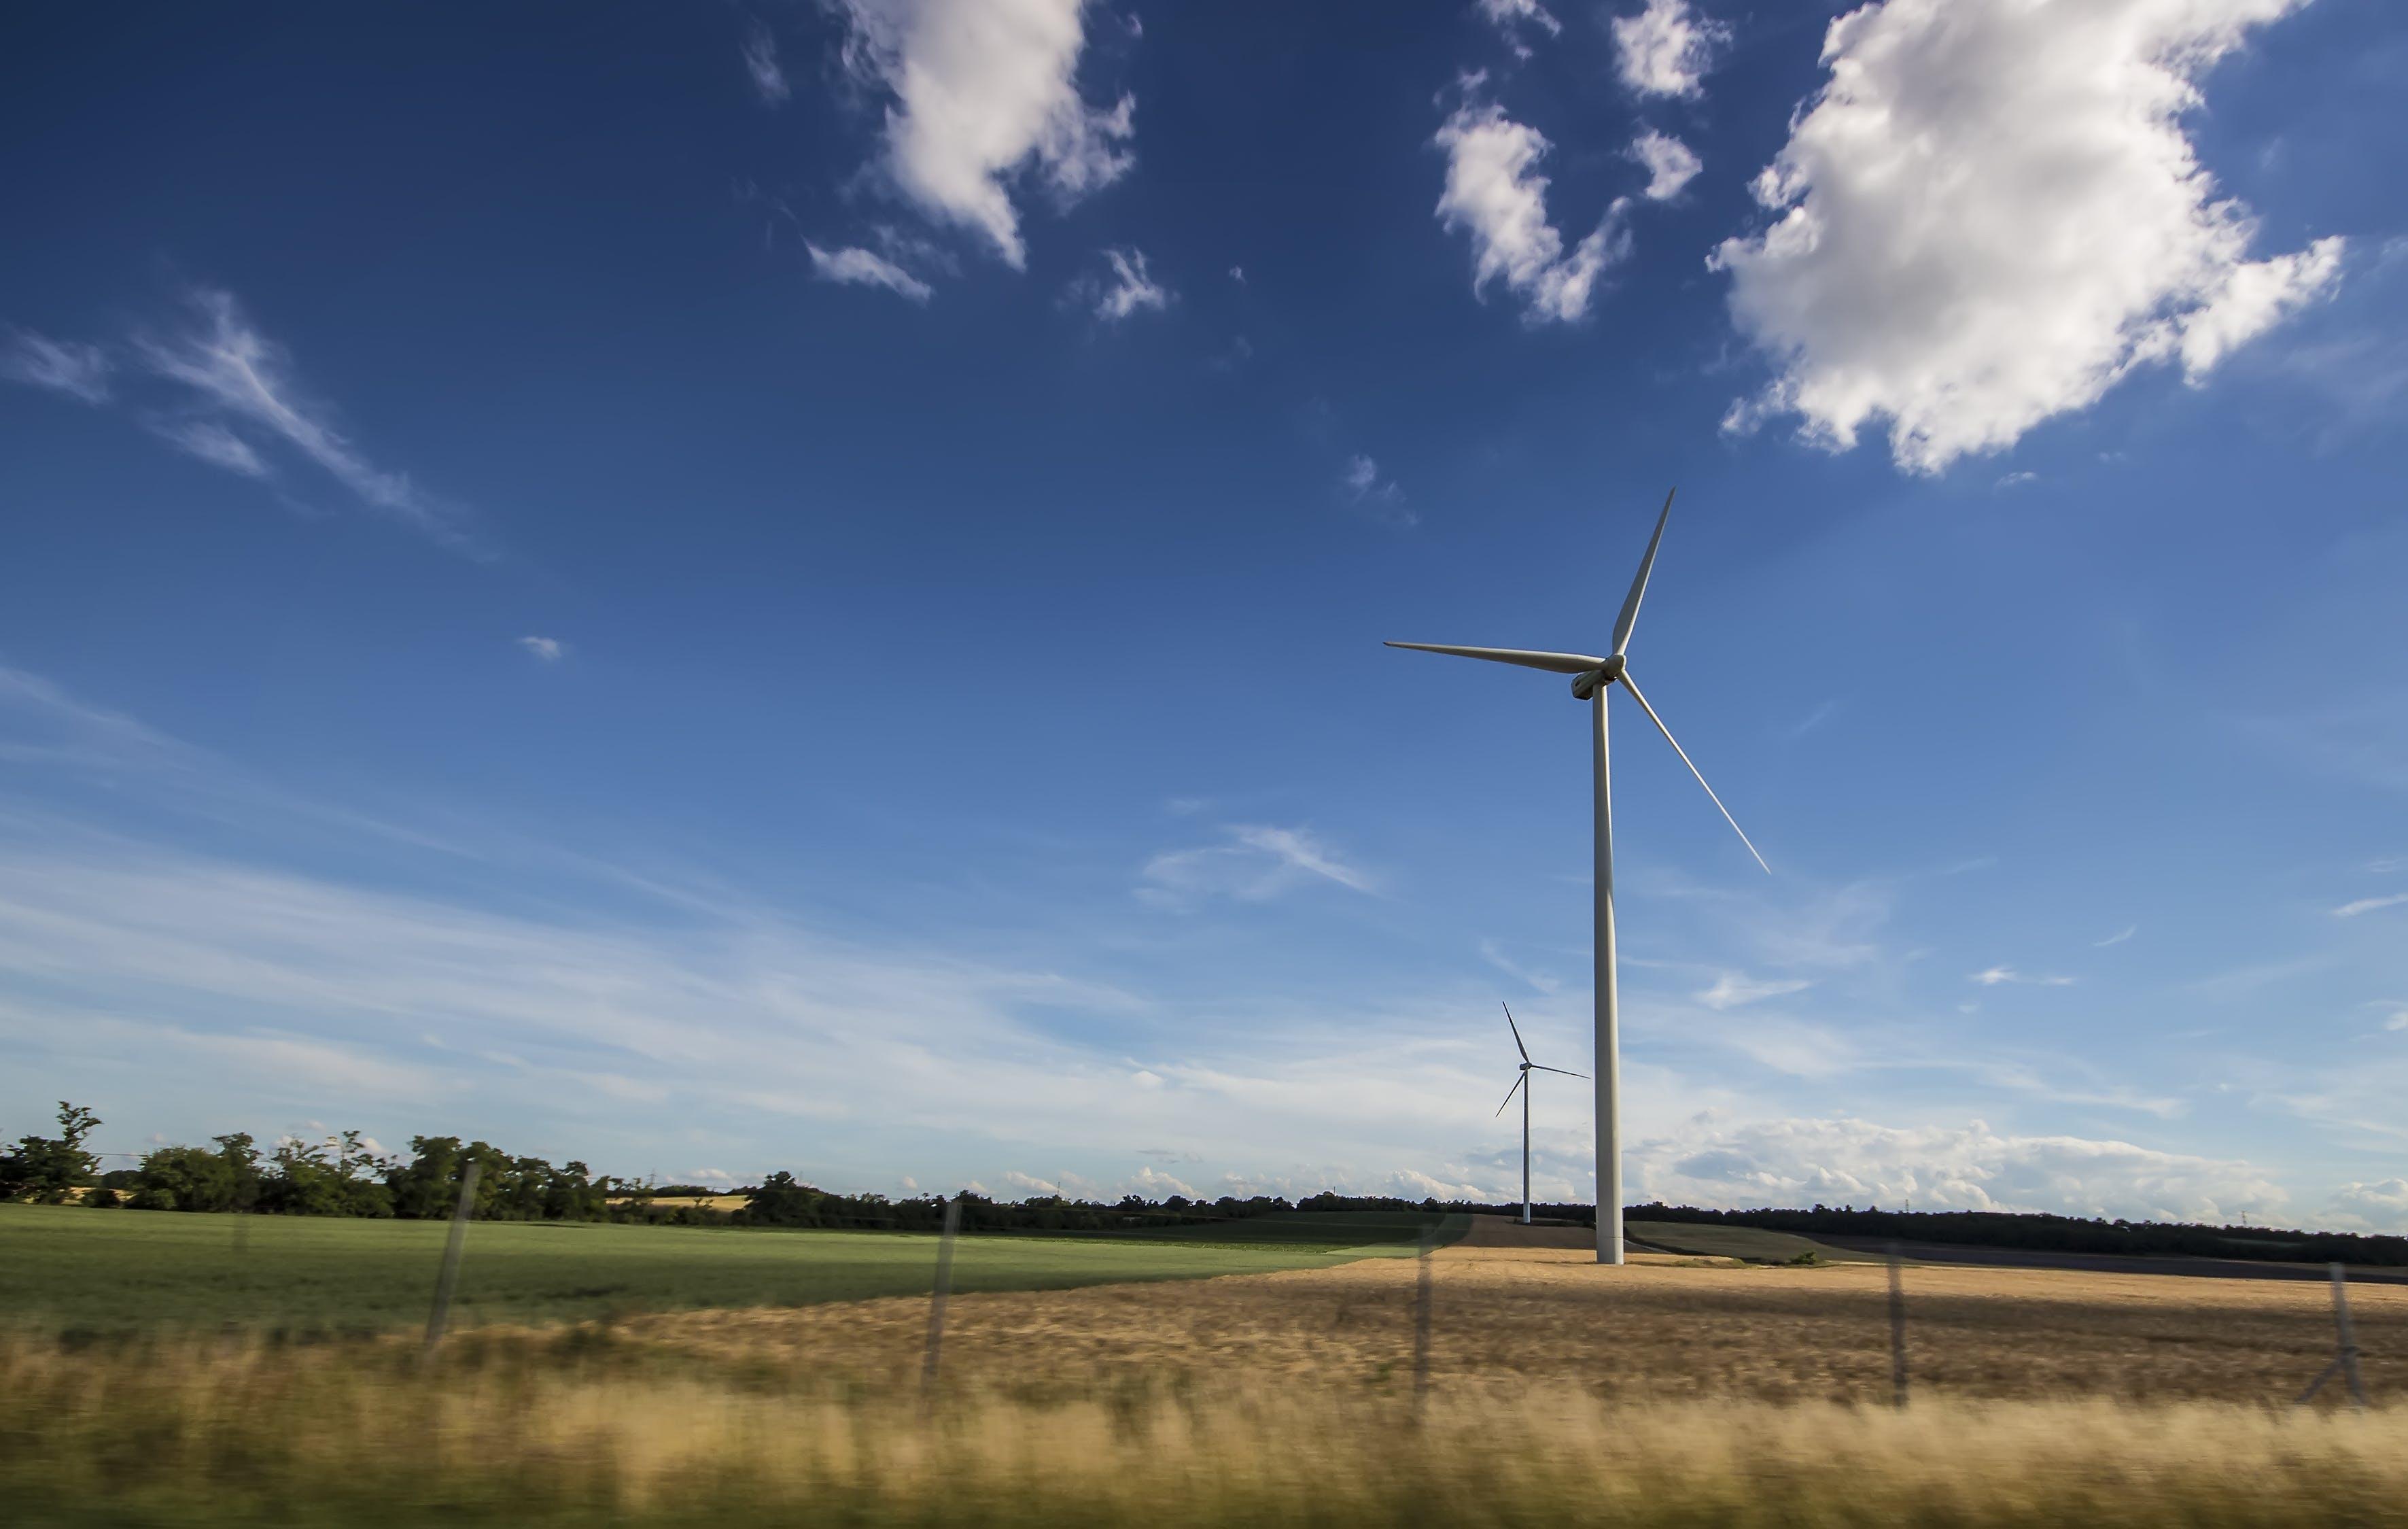 Kostenloses Stock Foto zu himmel, feld, erneuerbare energie, windturbine